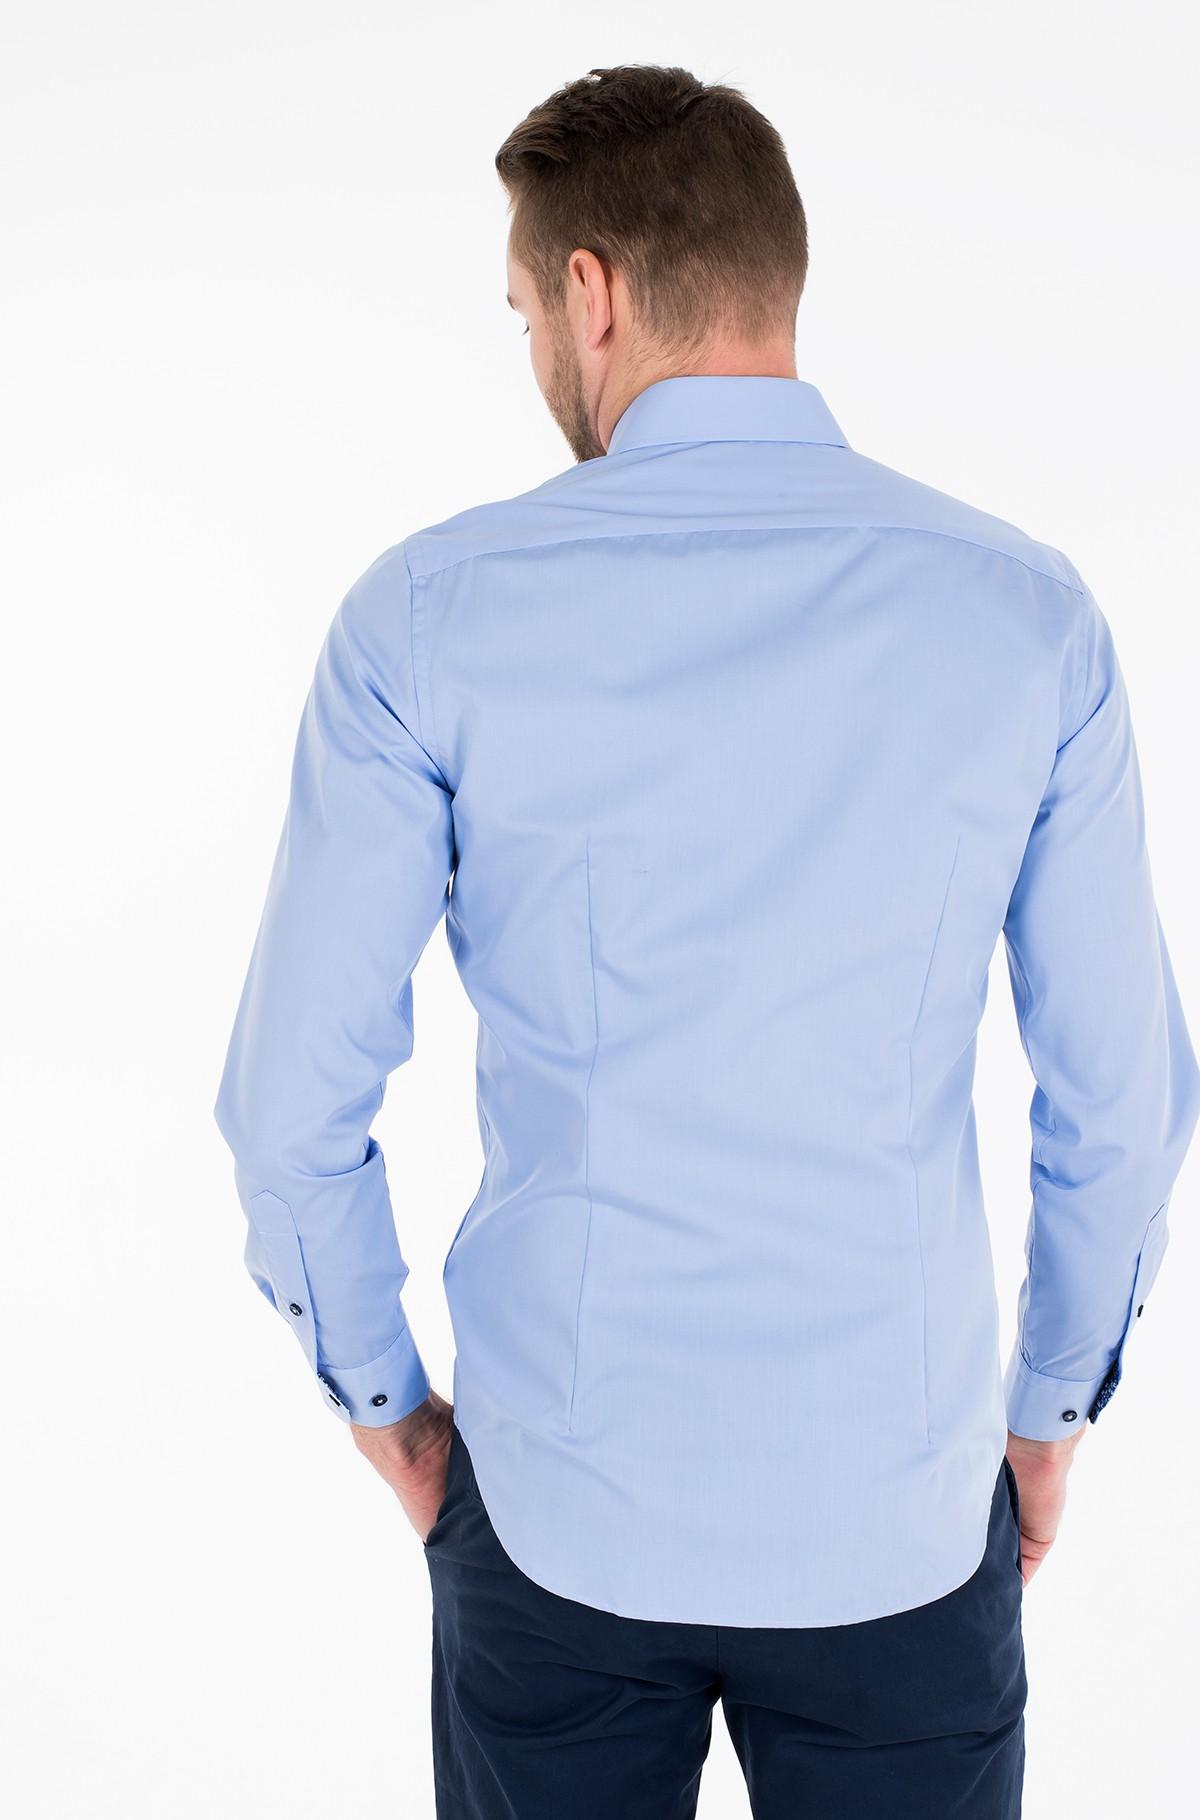 Marškiniai POPLIN CLASSIC SLIM SHIRT-full-2